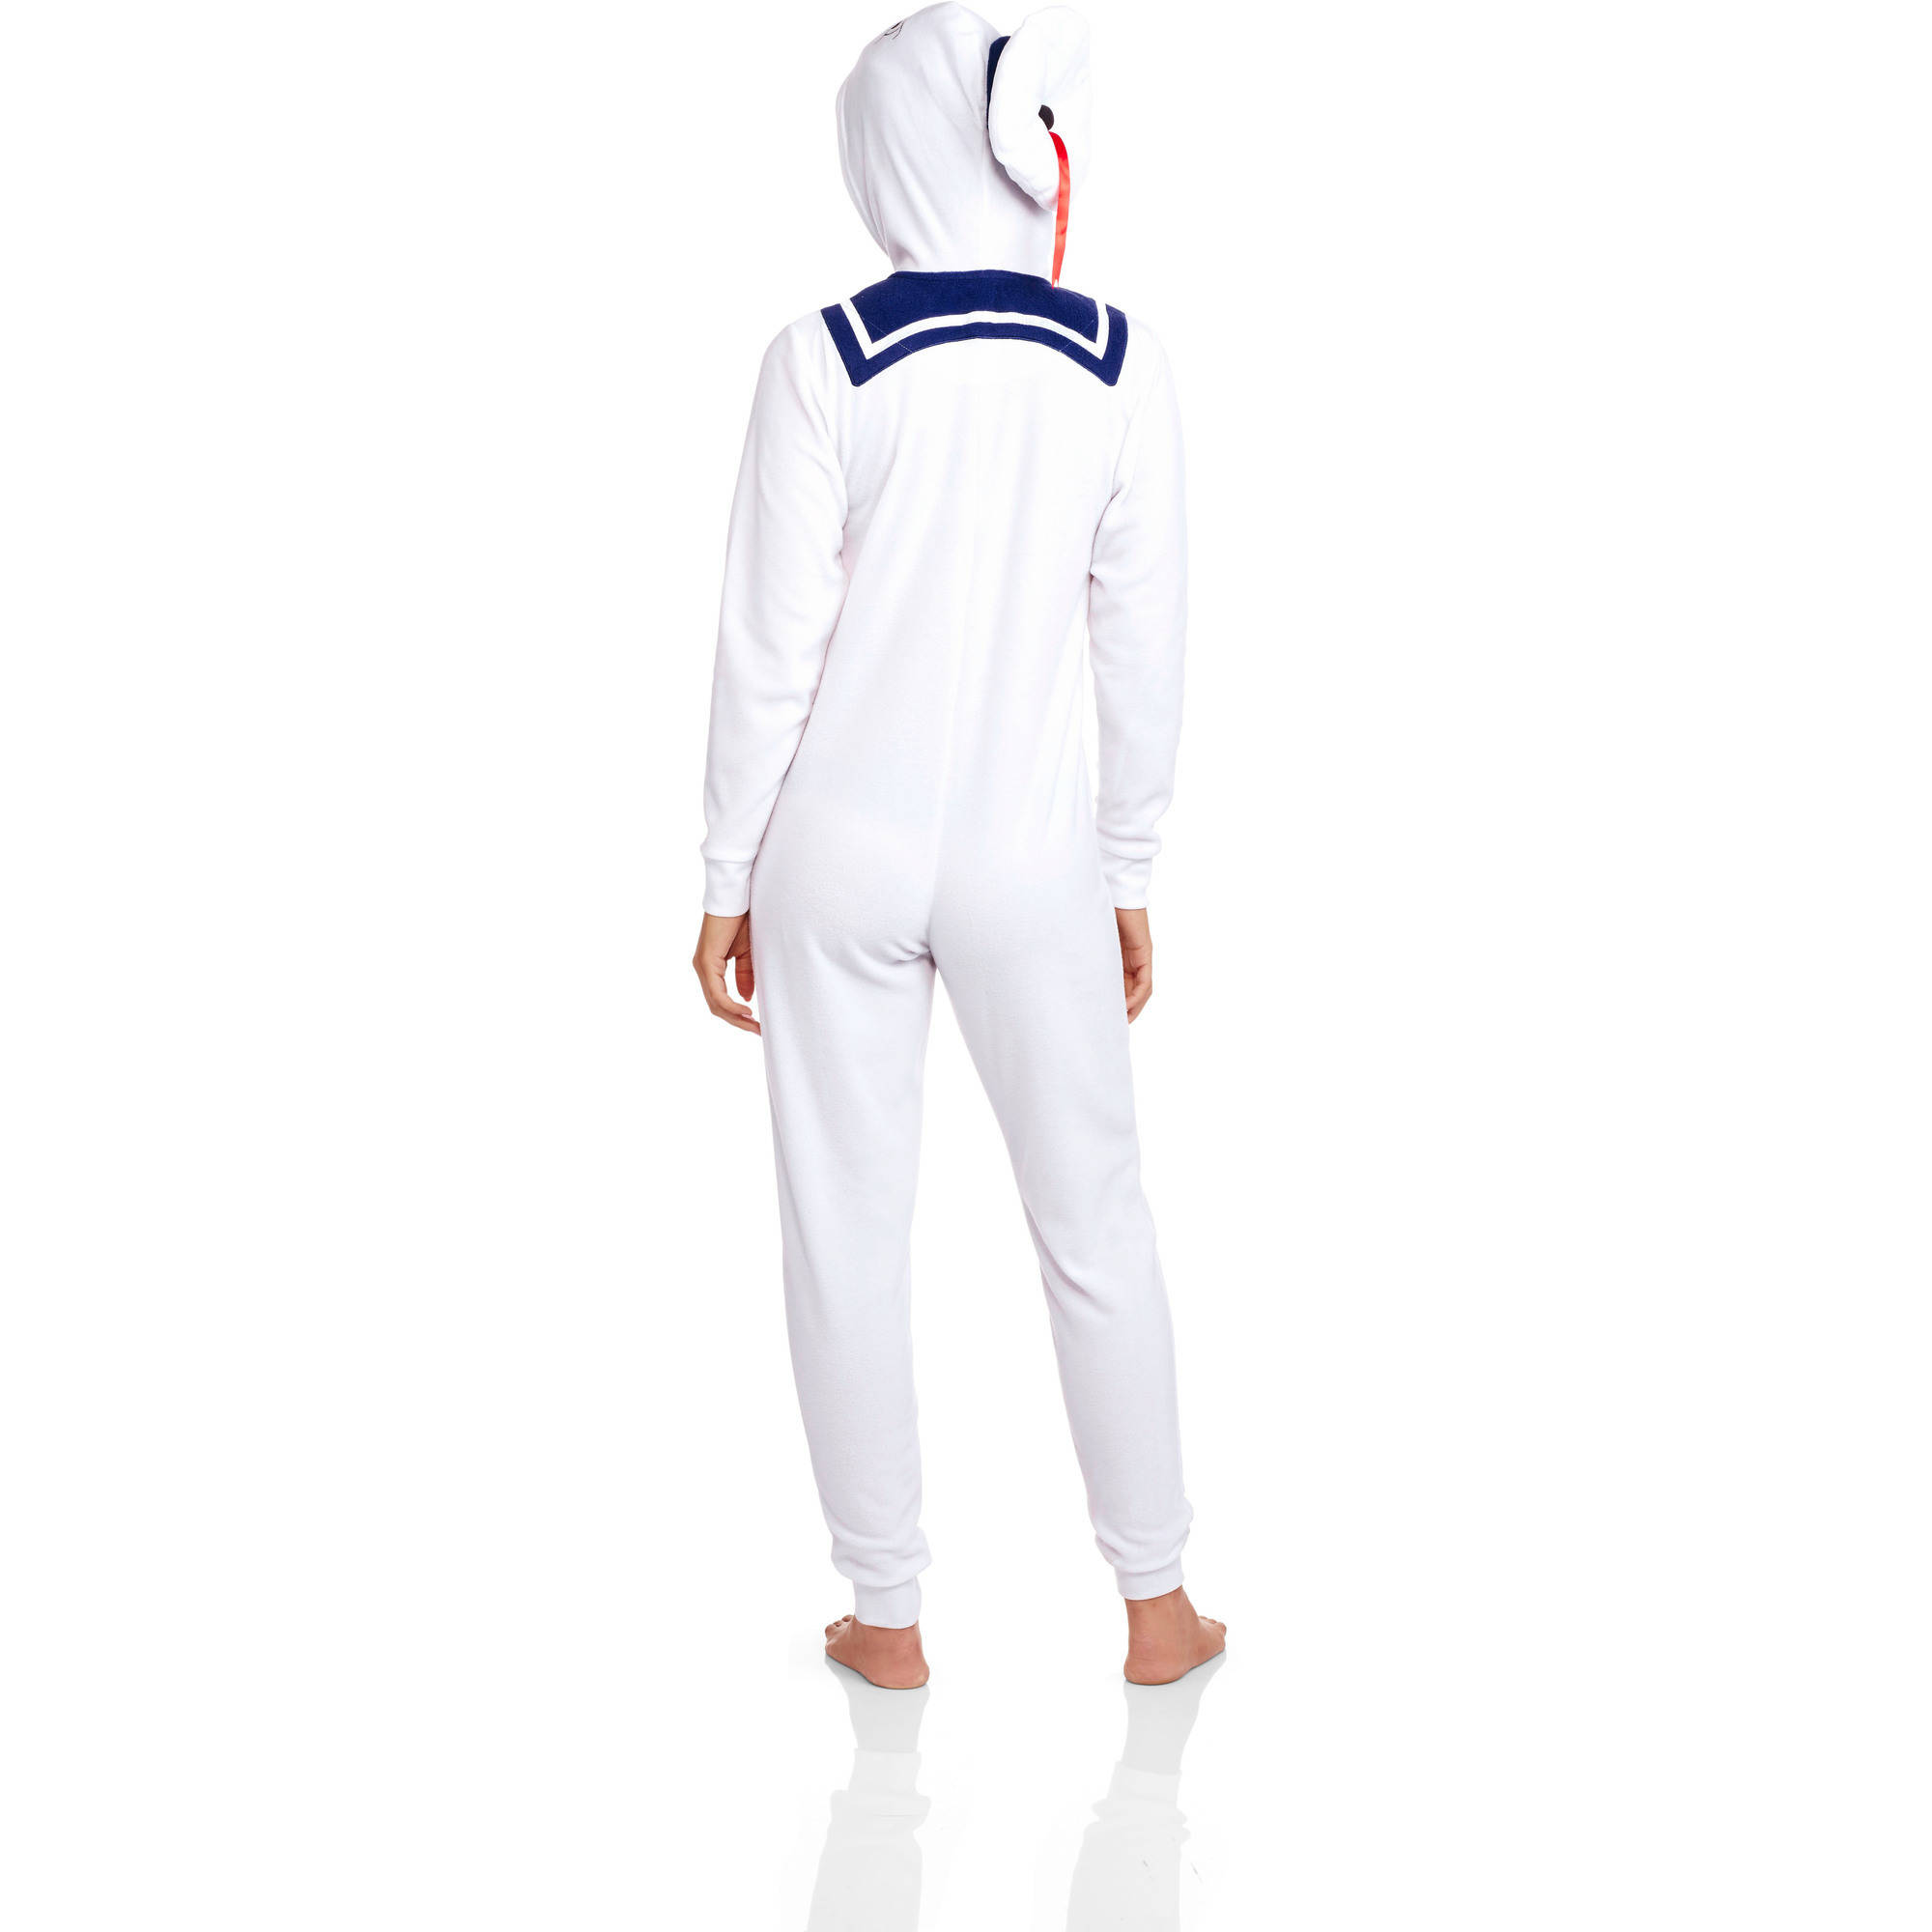 b2b5d634e0 Ghostbusters Women s License Pajama Unio - Walmart.com